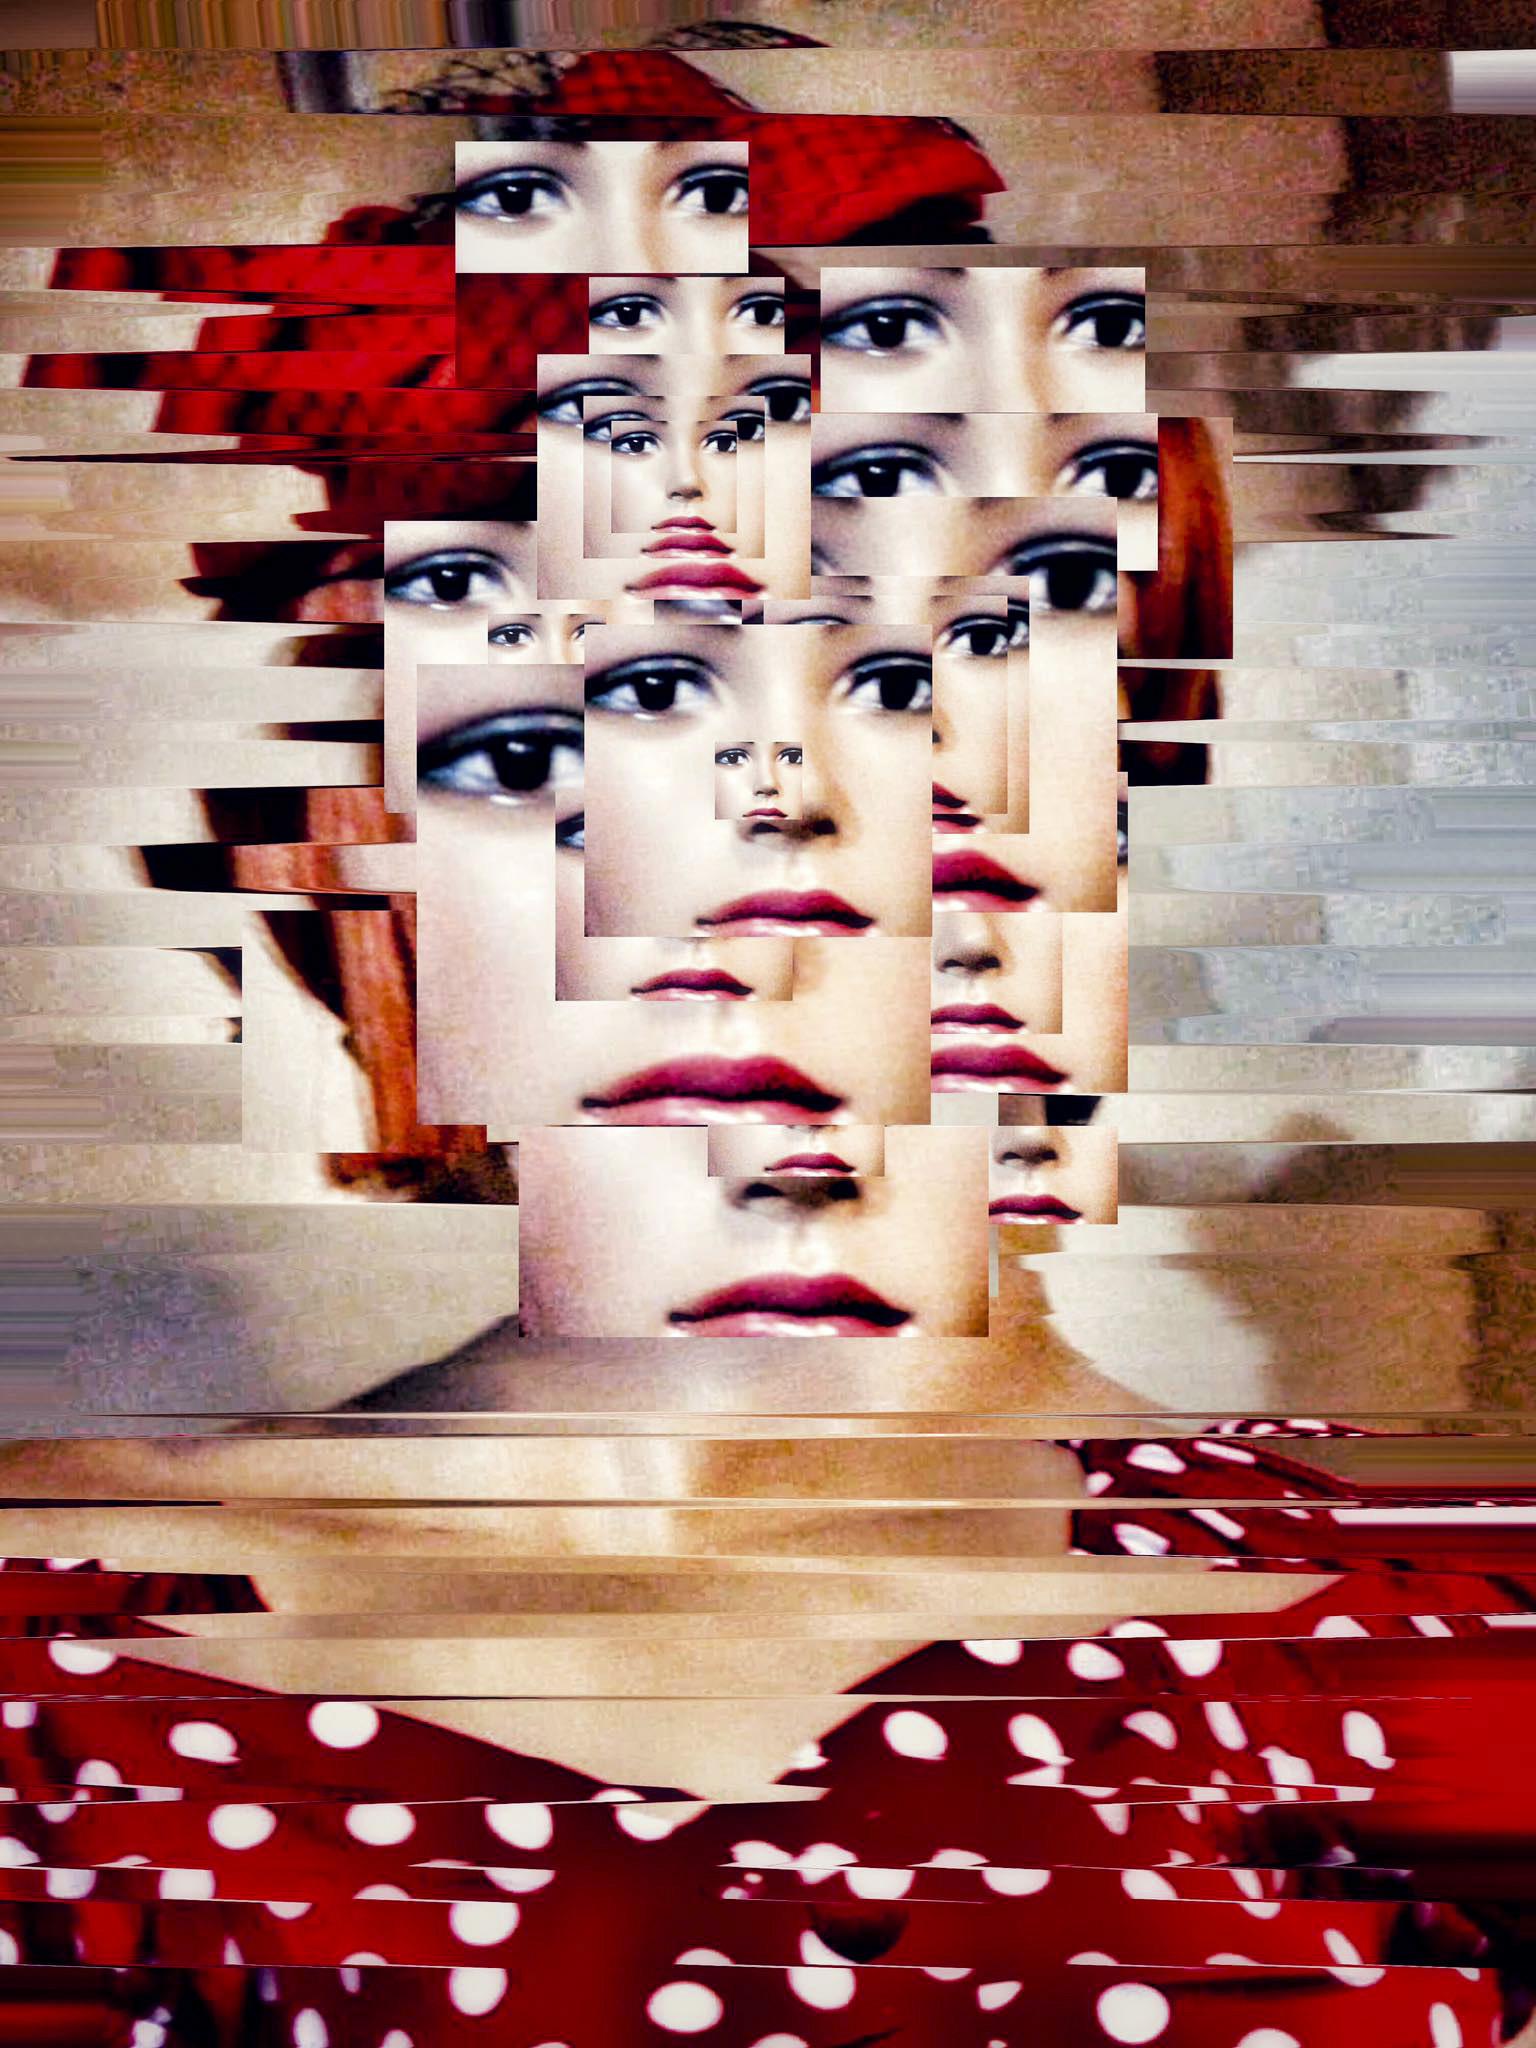 © Vanessa Rusci | Defragmented